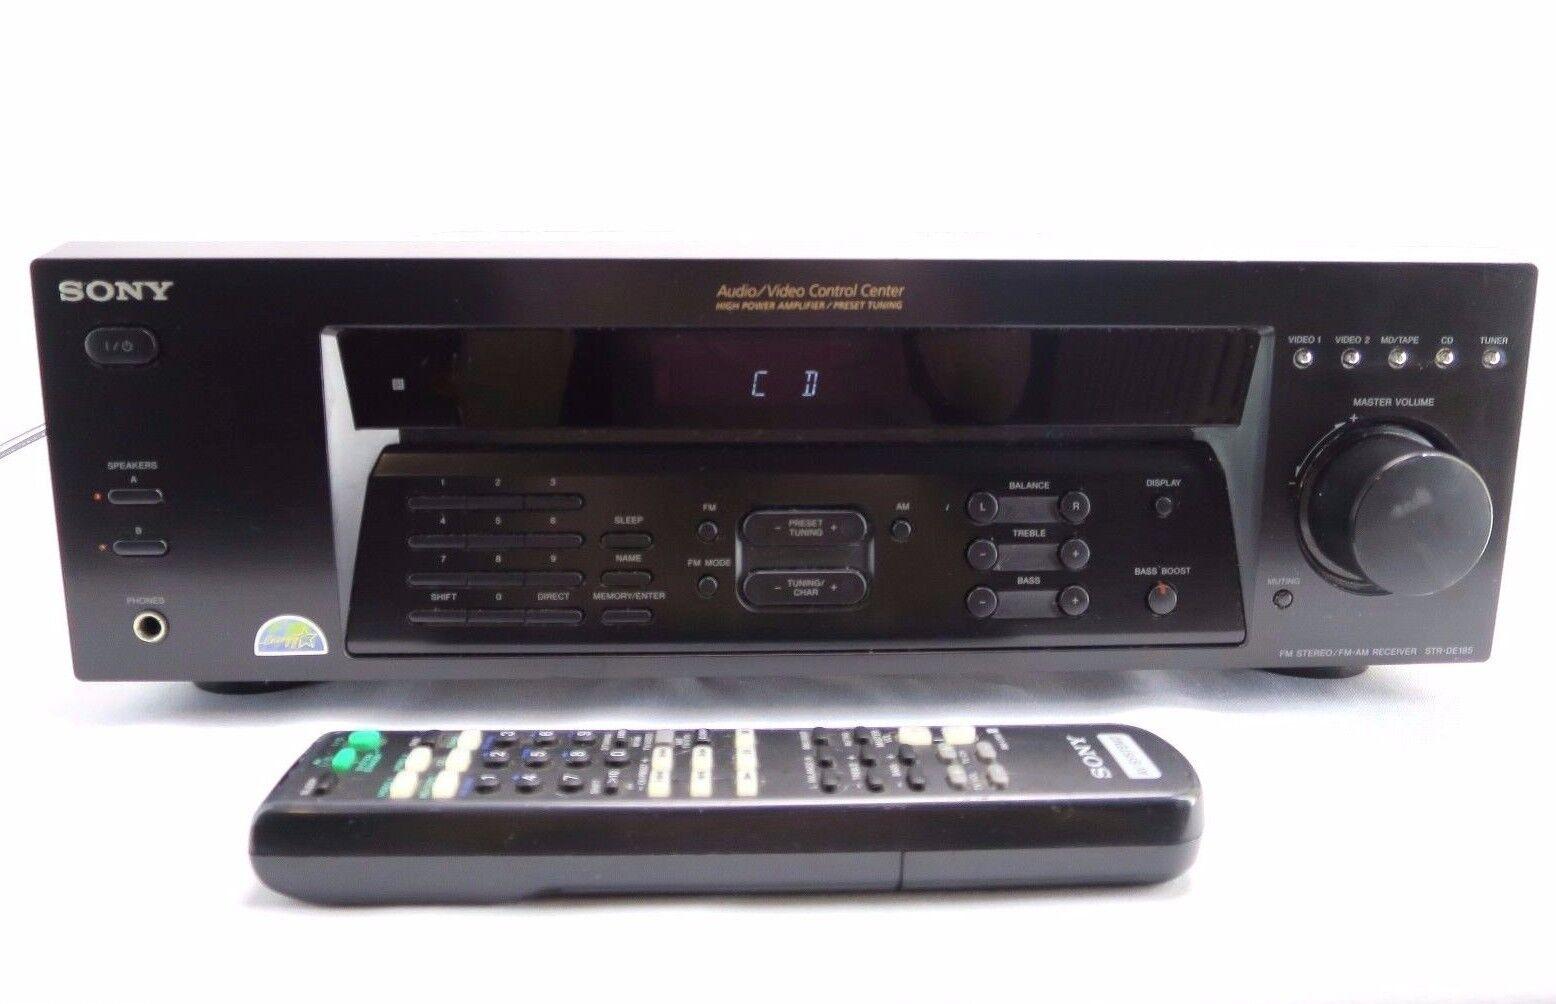 sony str de185 stereo receiver 2 channel 100 watt. Black Bedroom Furniture Sets. Home Design Ideas